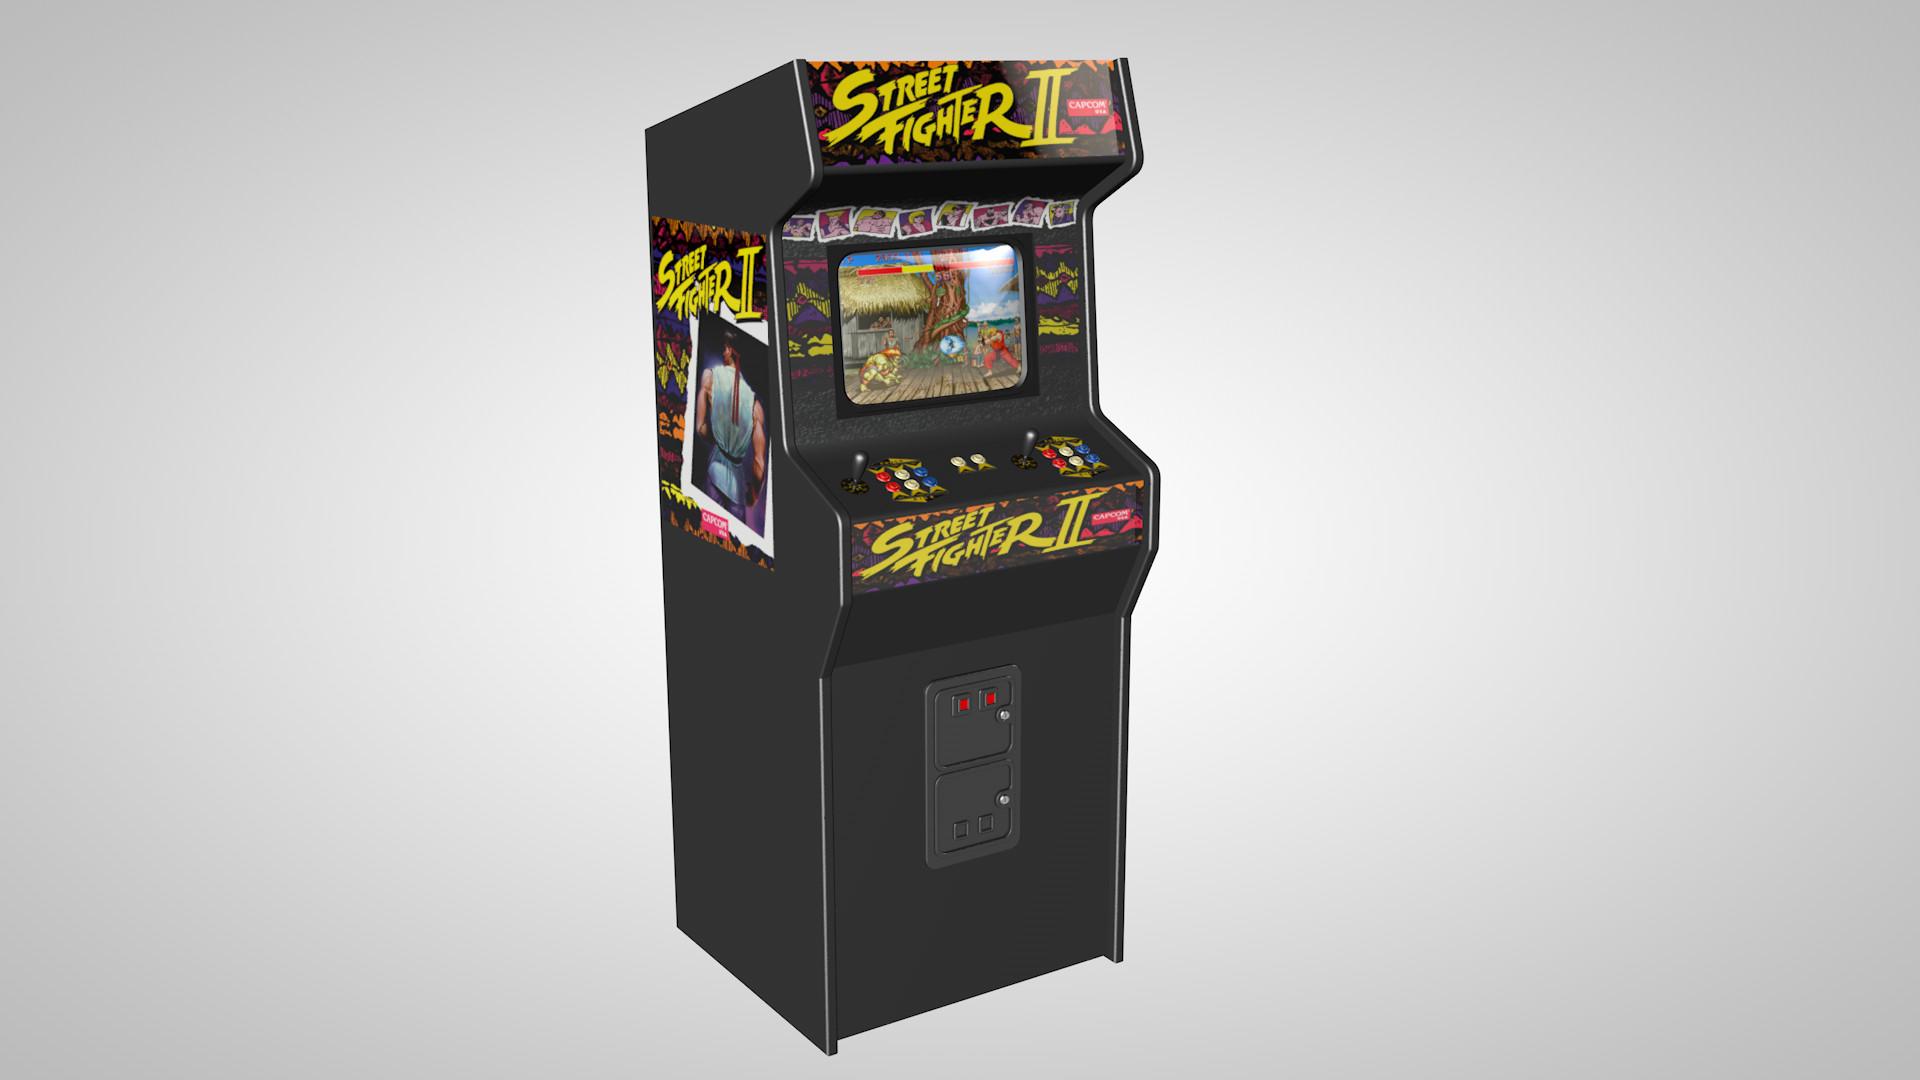 SF2_Arcade_Machinea.png